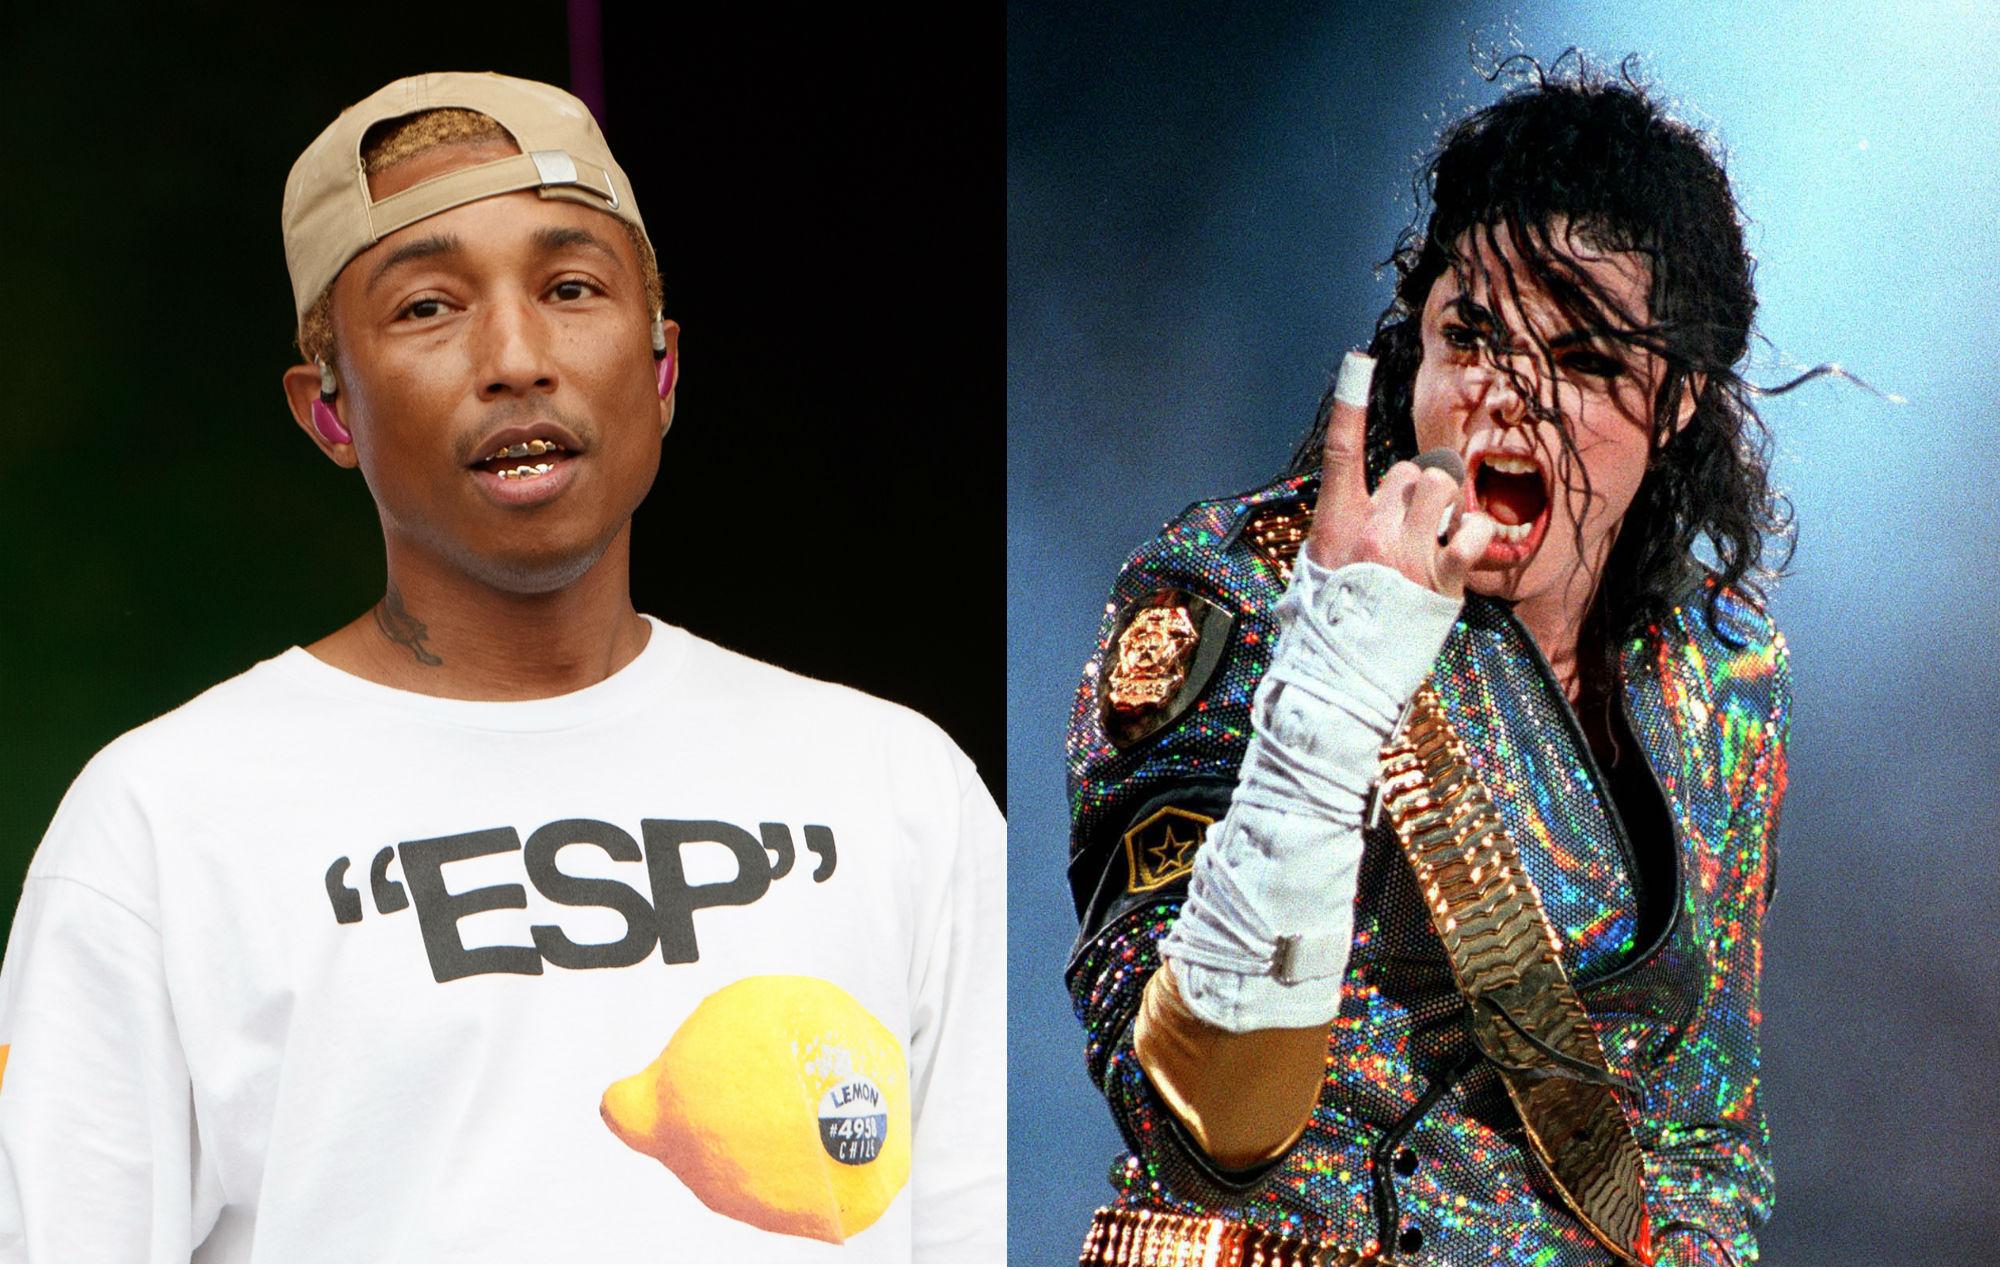 Pharrell says songs on Justin Timberlake's debut were written for Michael Jackson